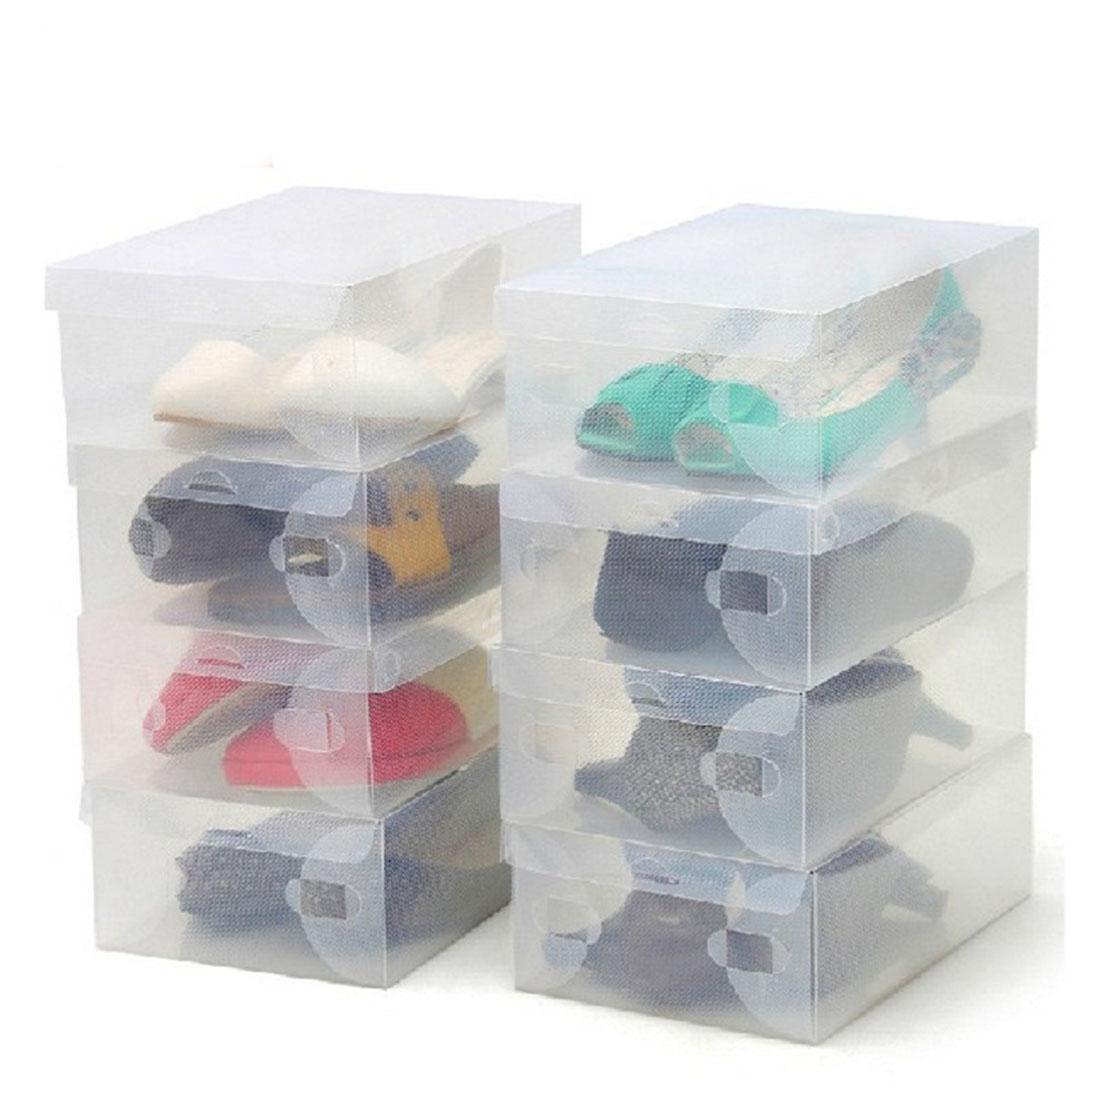 2016 new 10Pcs Transparent Clear Plastic Shoes Storage Boxes Foldable Shoes Case Holder(China (Mainland))